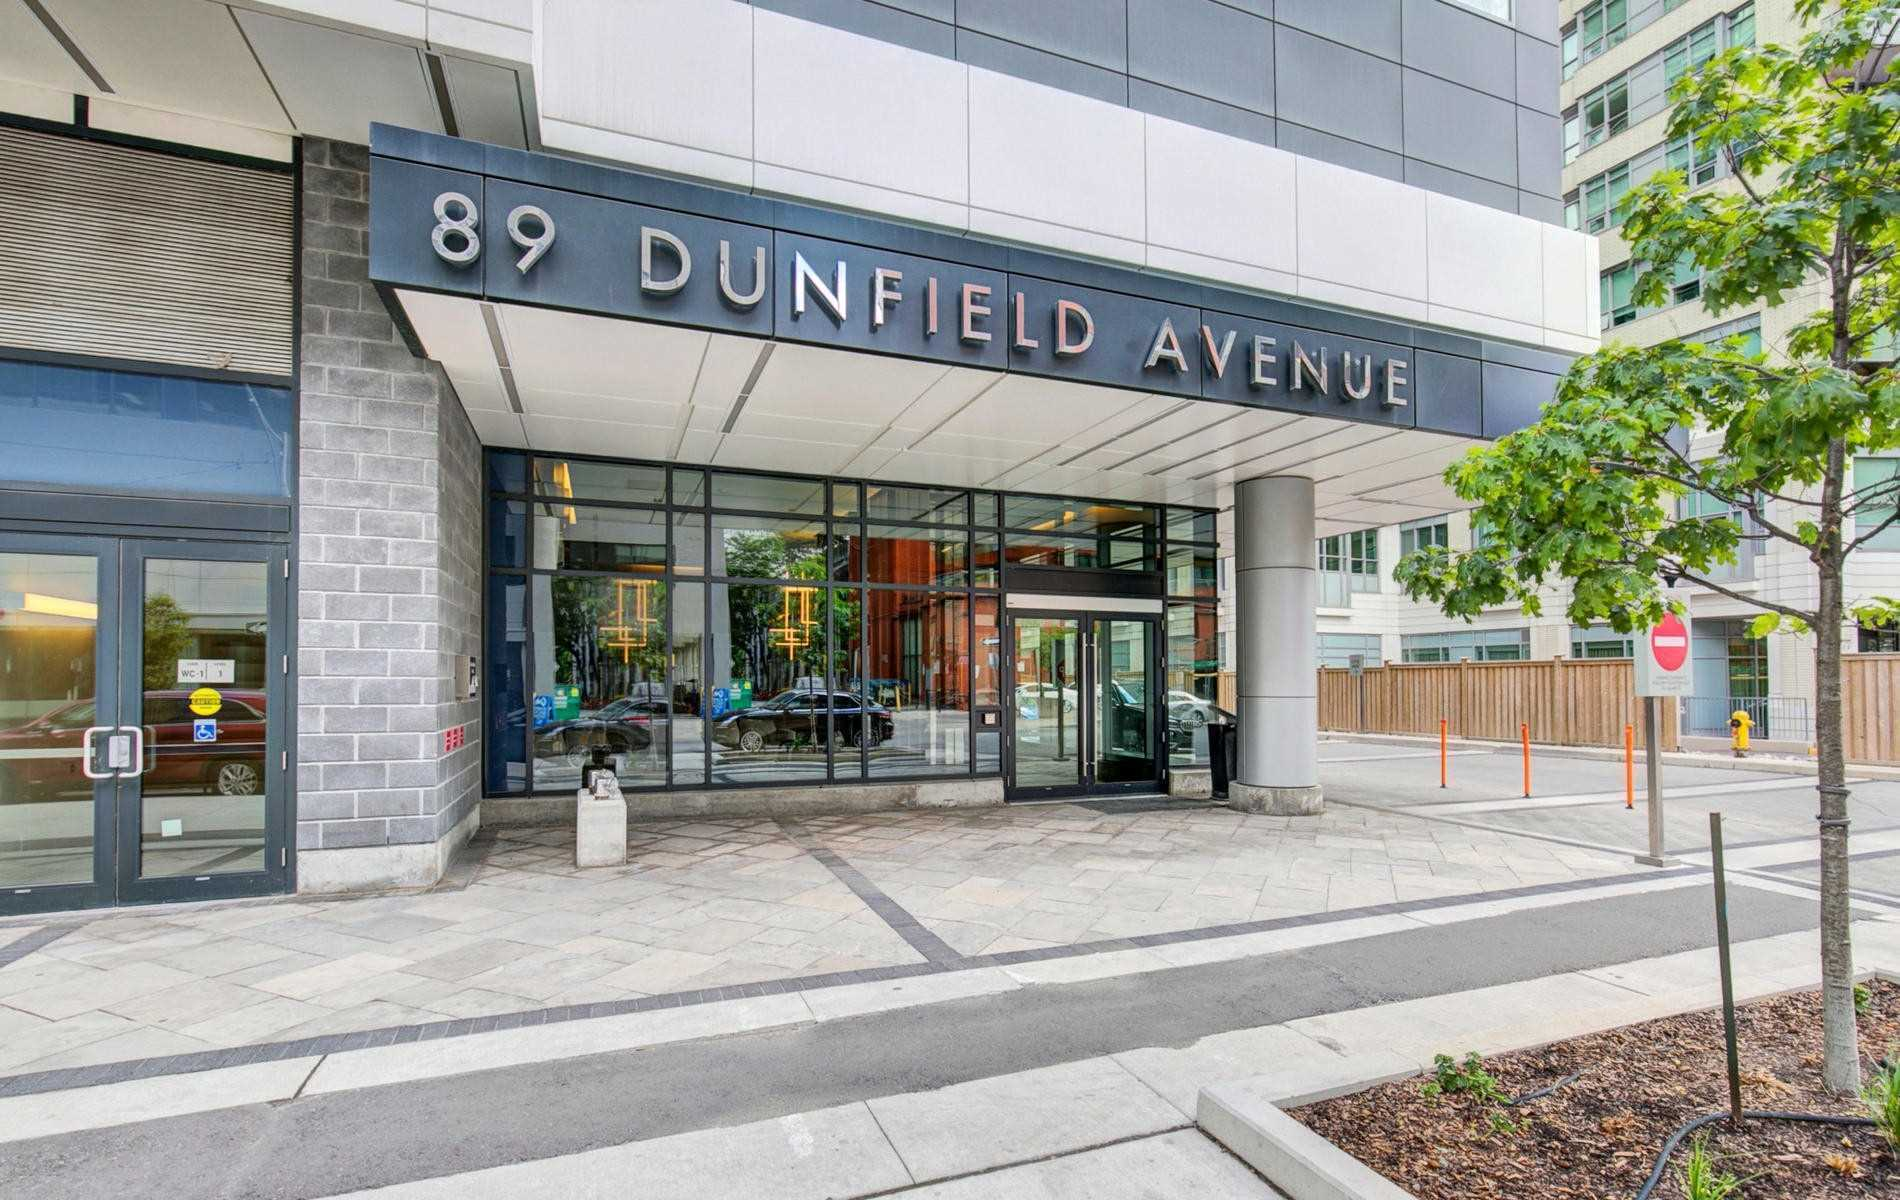 #1810 - 89 Dunfield Ave, Toronto C4558235